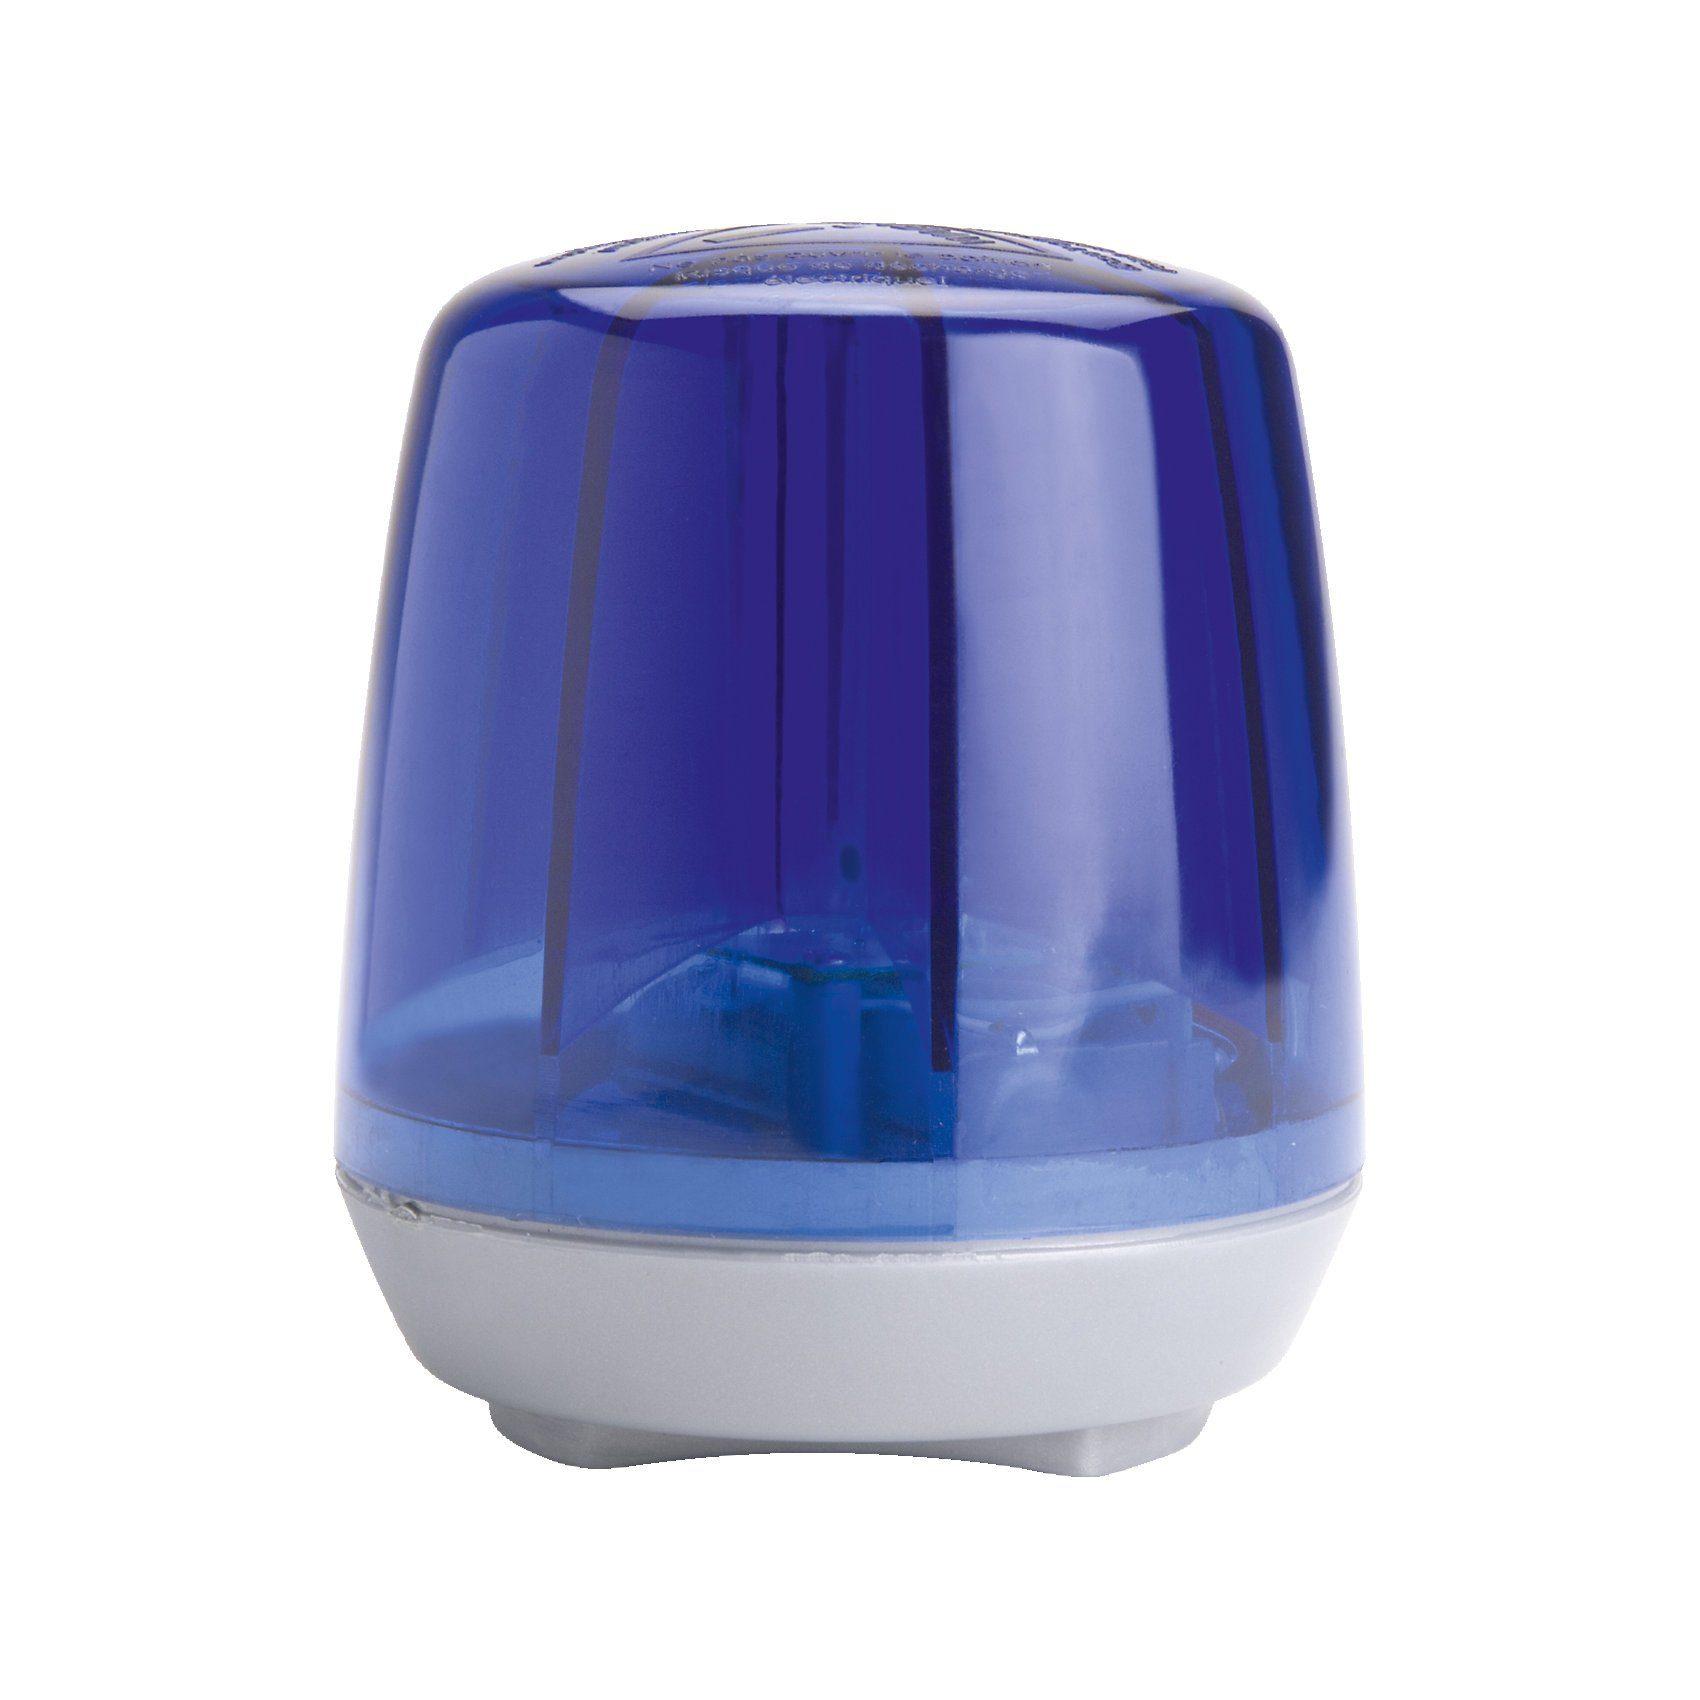 Rolly Toys Flashlight blau Rundum-Leuchte